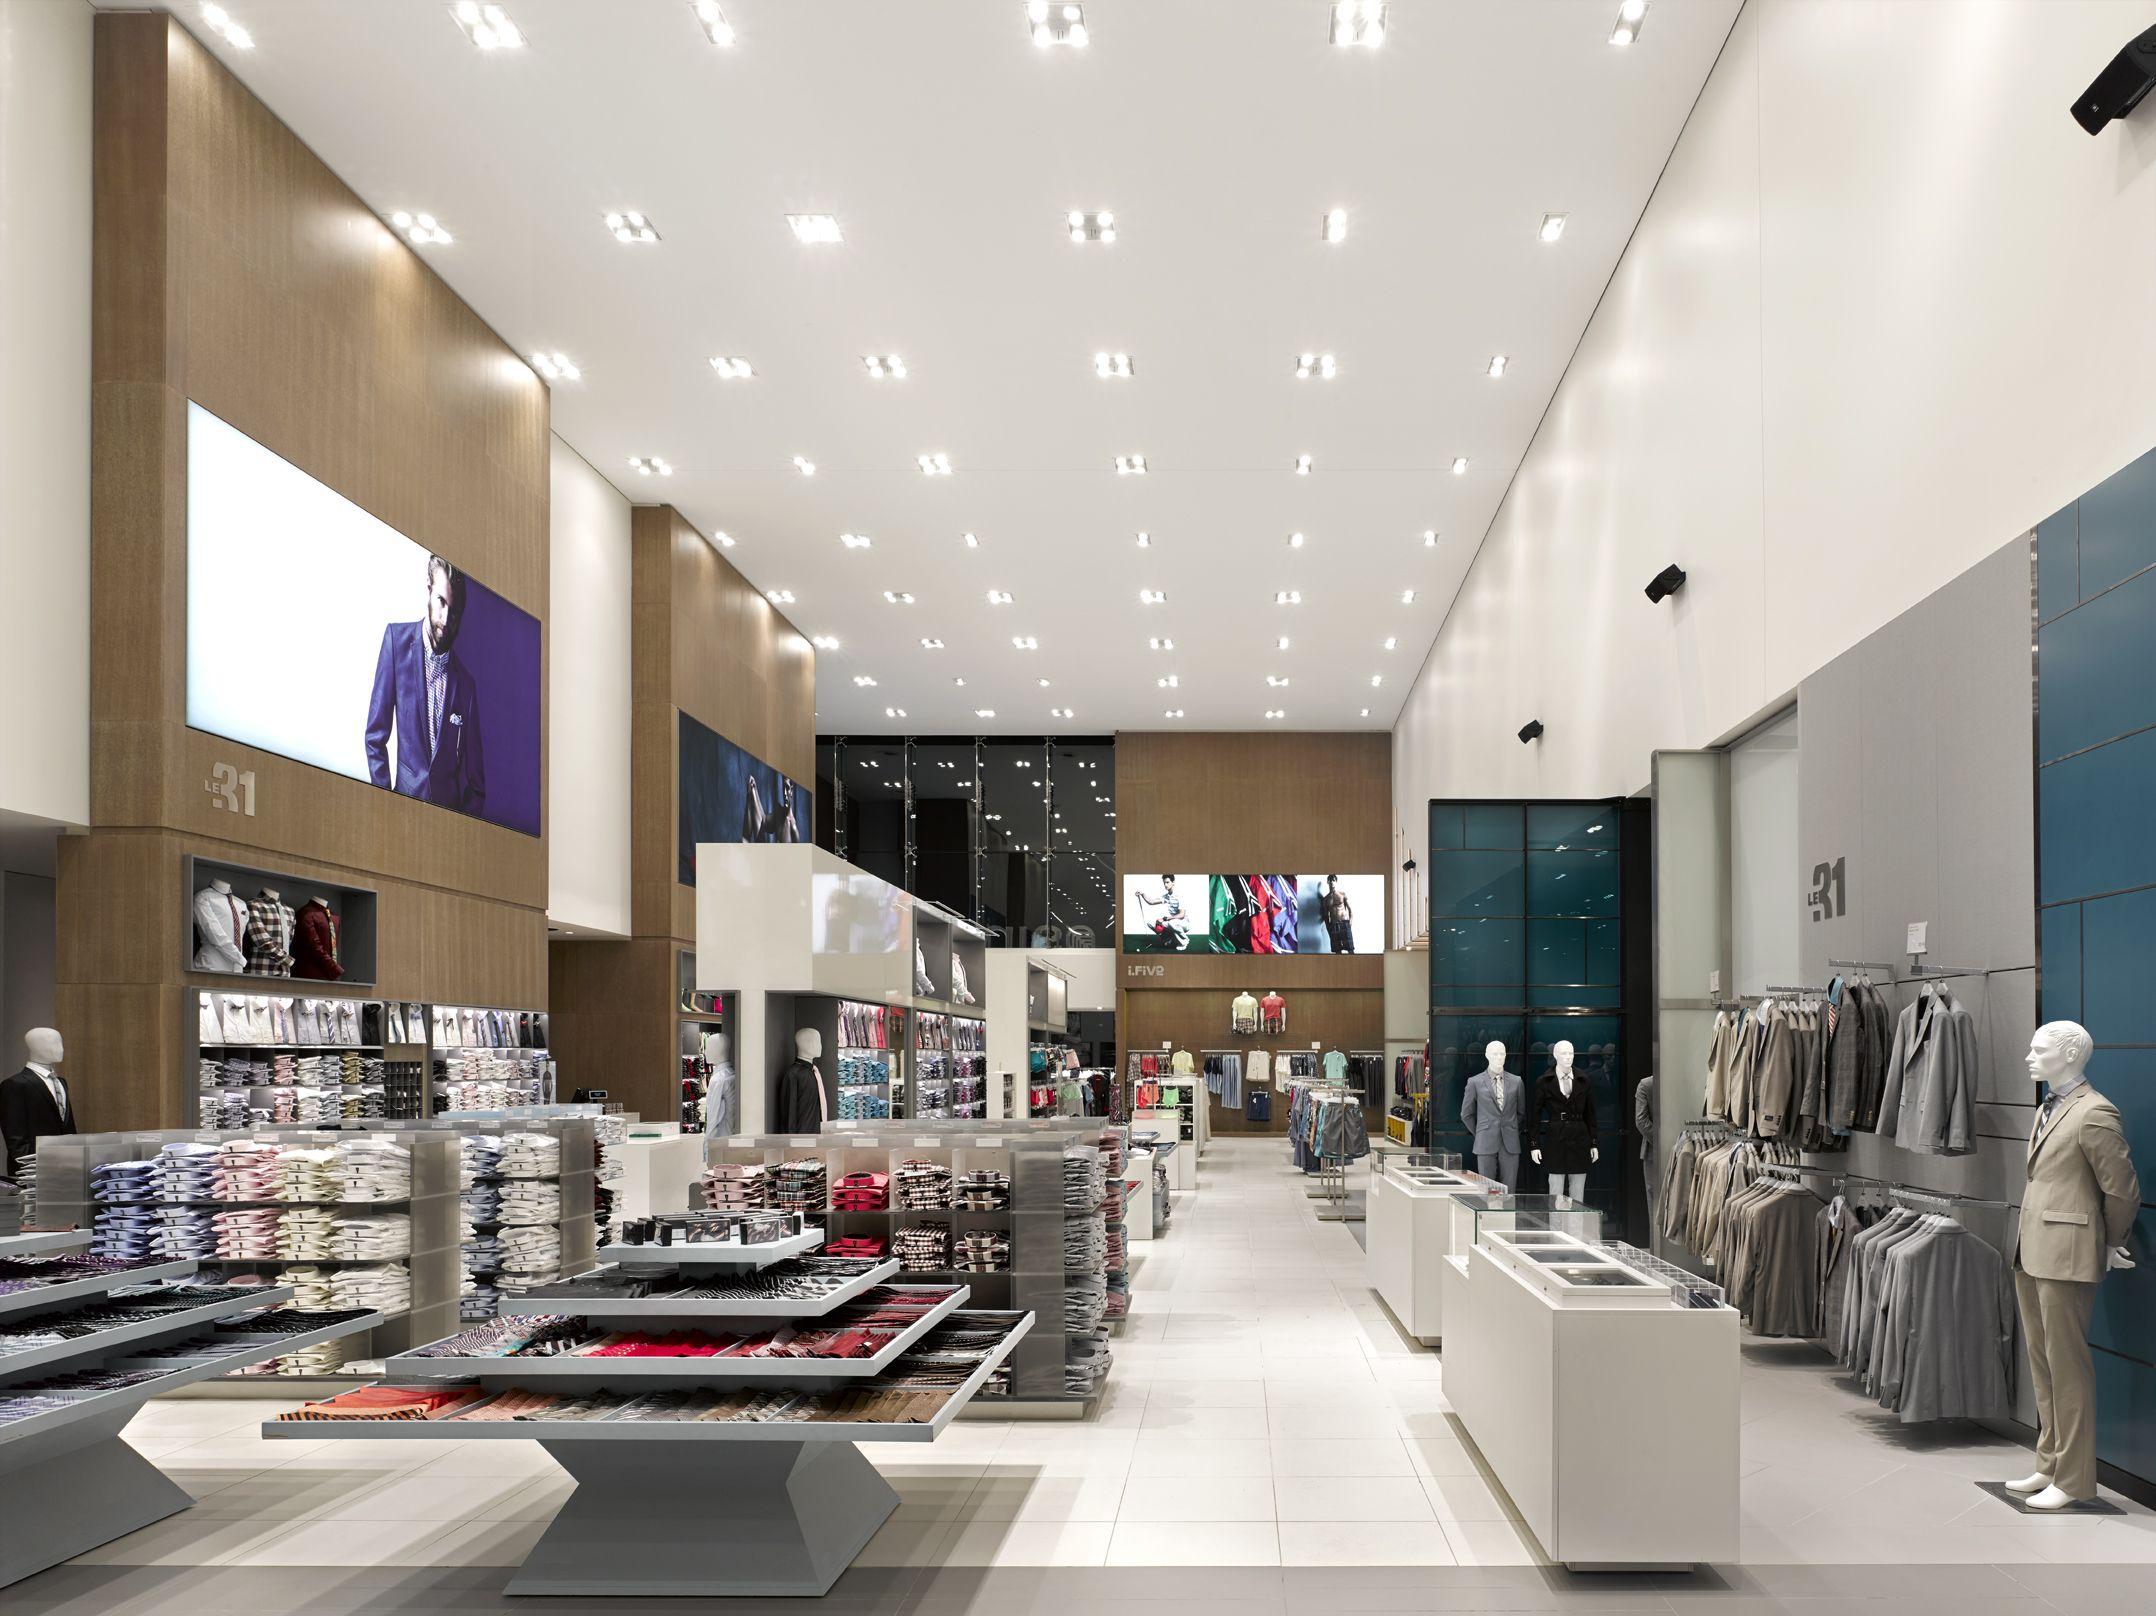 Lemaymichaud design architecture interior design simons explore simons store commercial design and more aloadofball Images